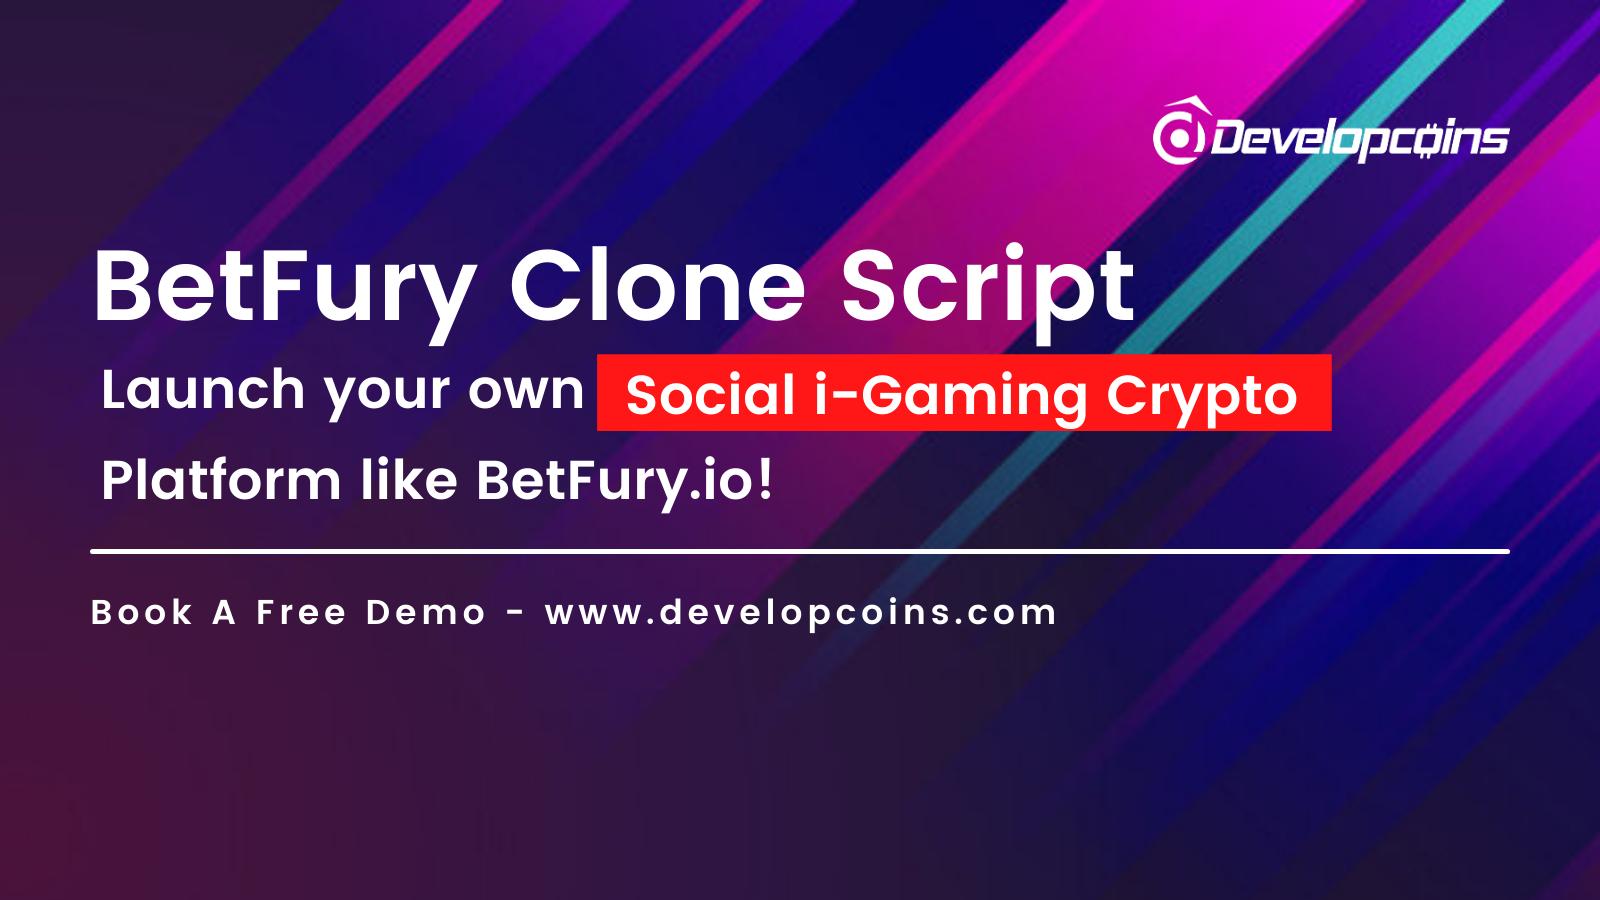 Launch Your Own Social i-Gaming Crypto Platform like BetFury.io